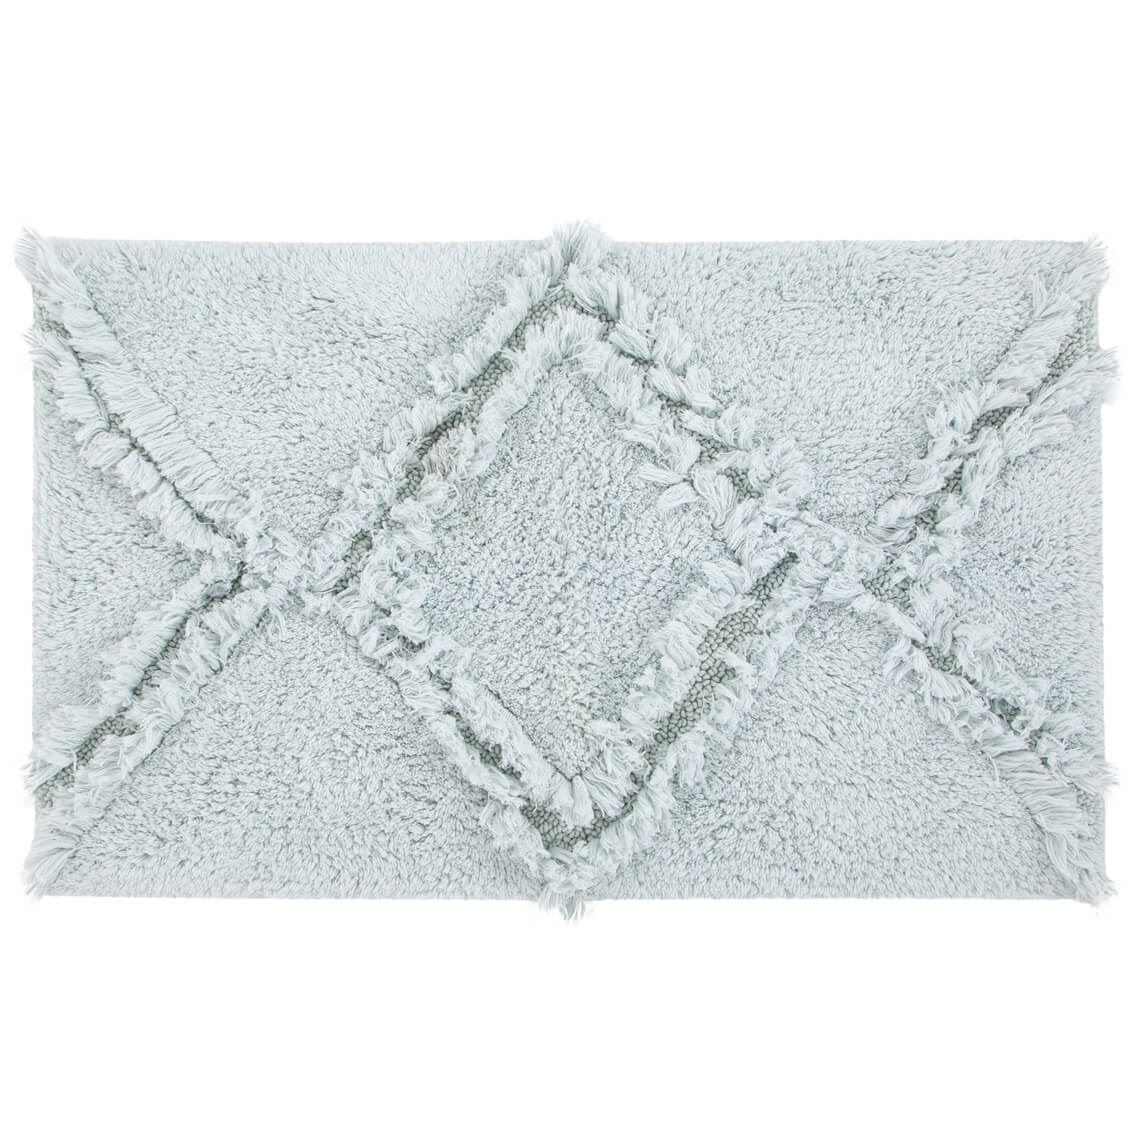 Kris Bathmat Size W 50cm x D 80cm x H 2cm in Light Blue 100% Cotton Freedom